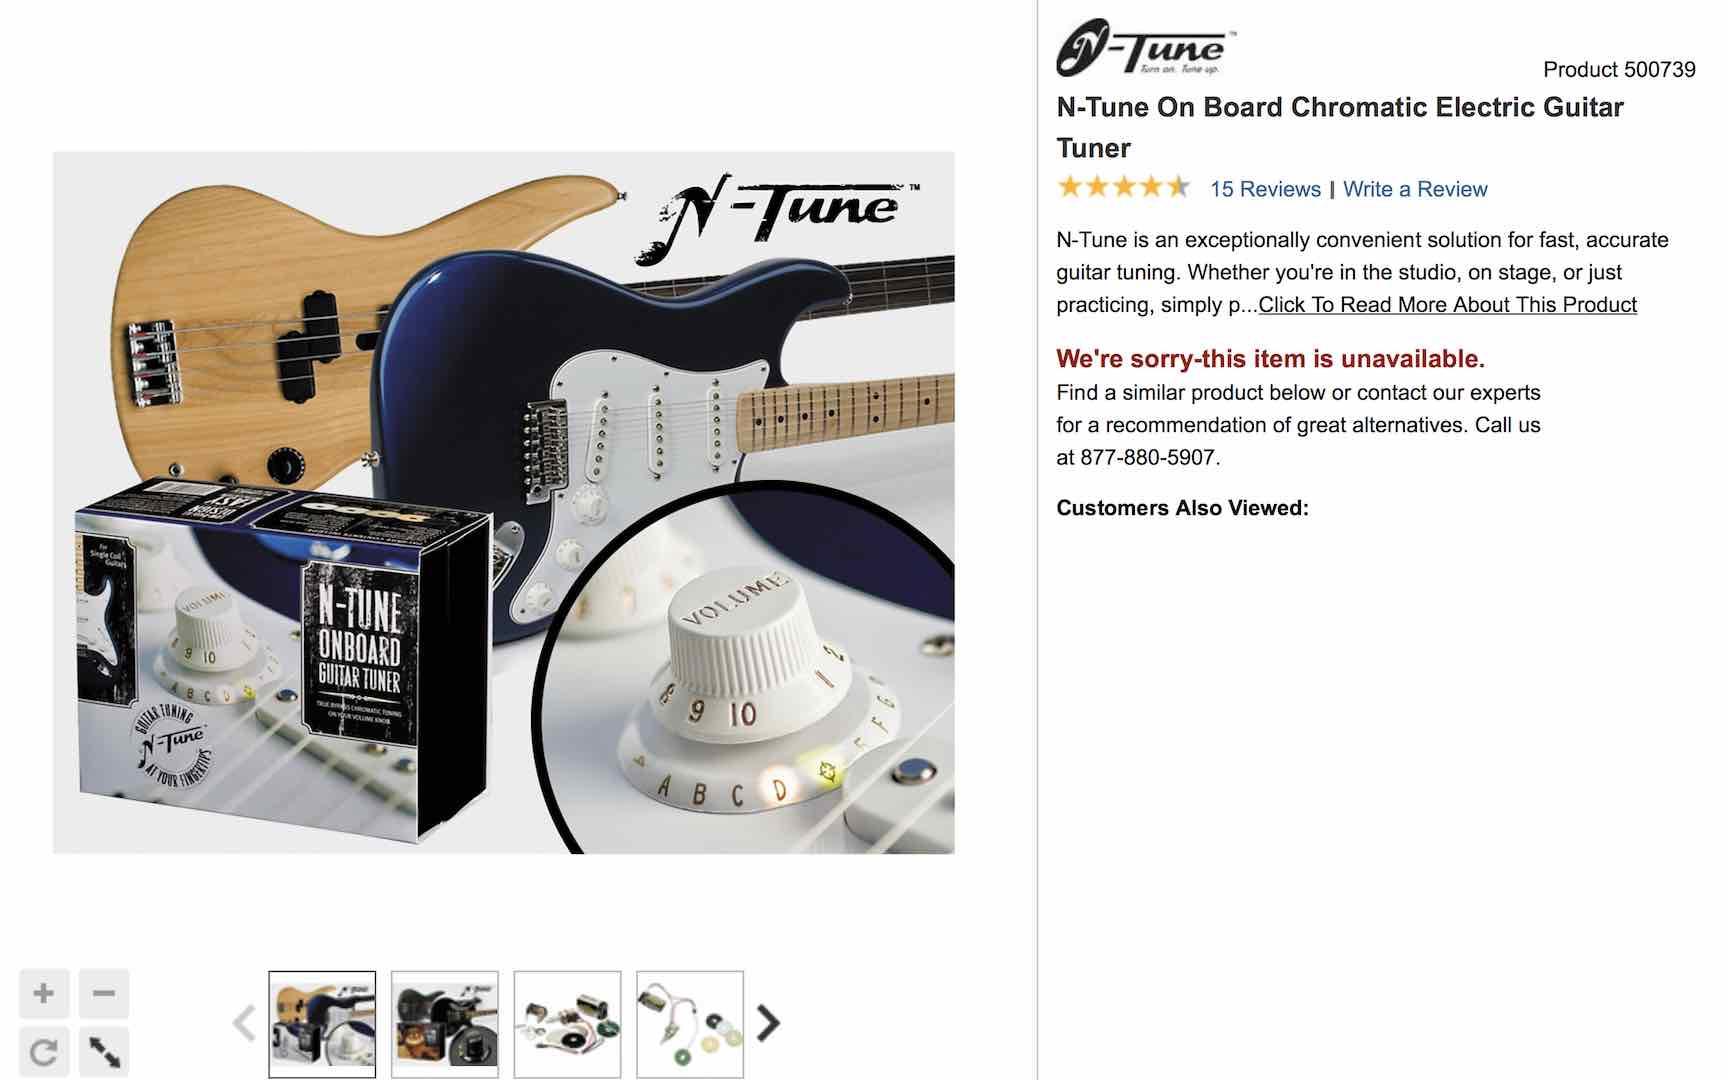 N-Tune-On-Board-Chromatic-Electric-Guitar-Tuner